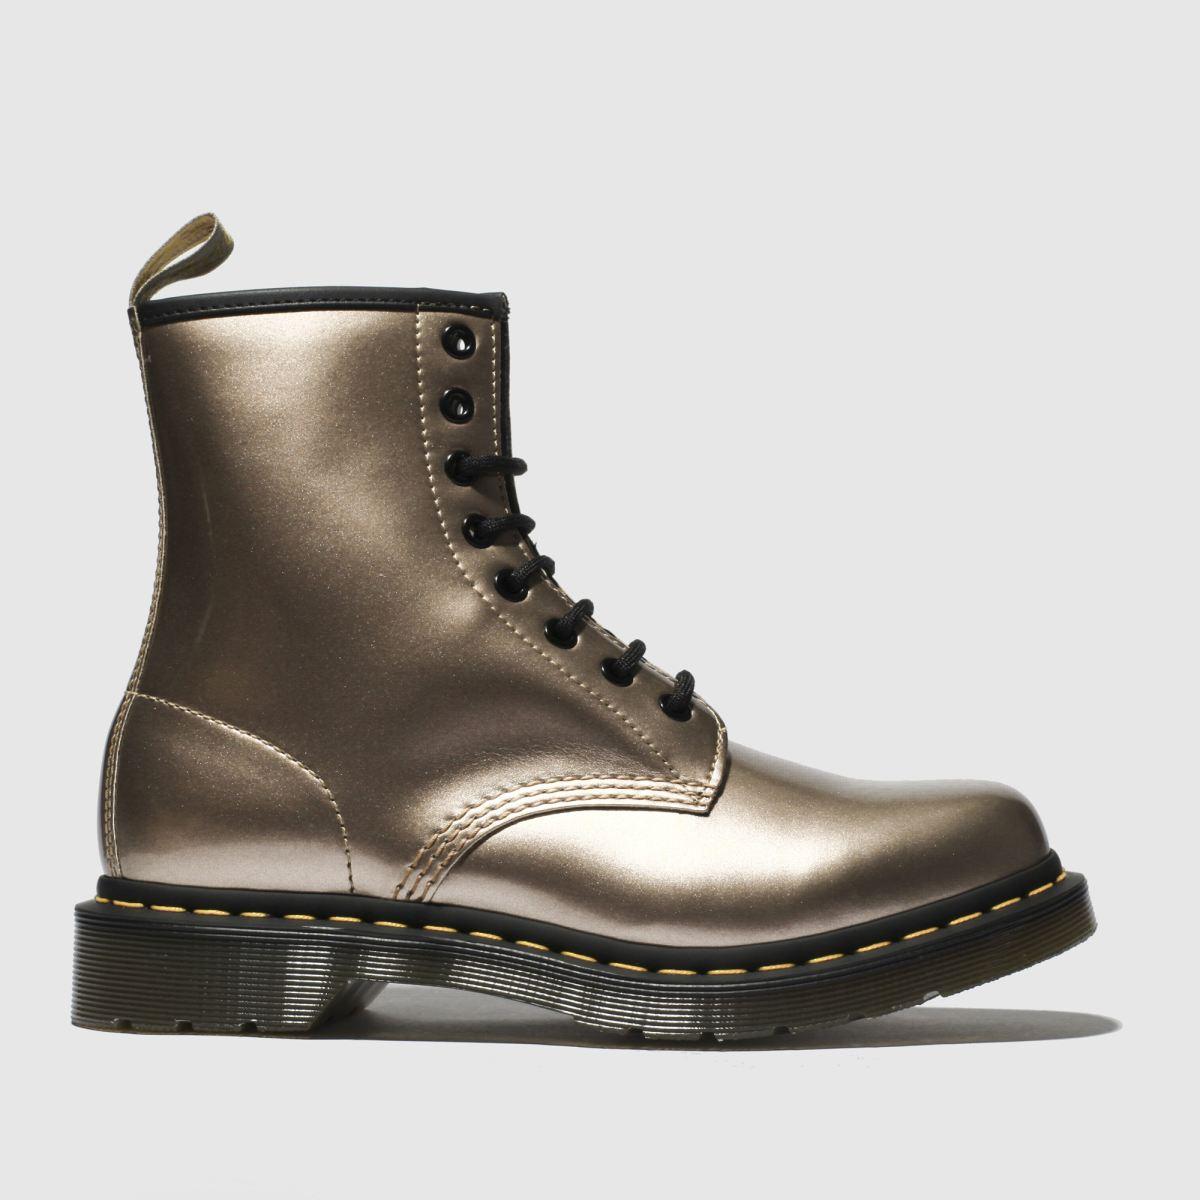 Dr Martens Gold 1460 Vegan Chrome 8 Eye Boots